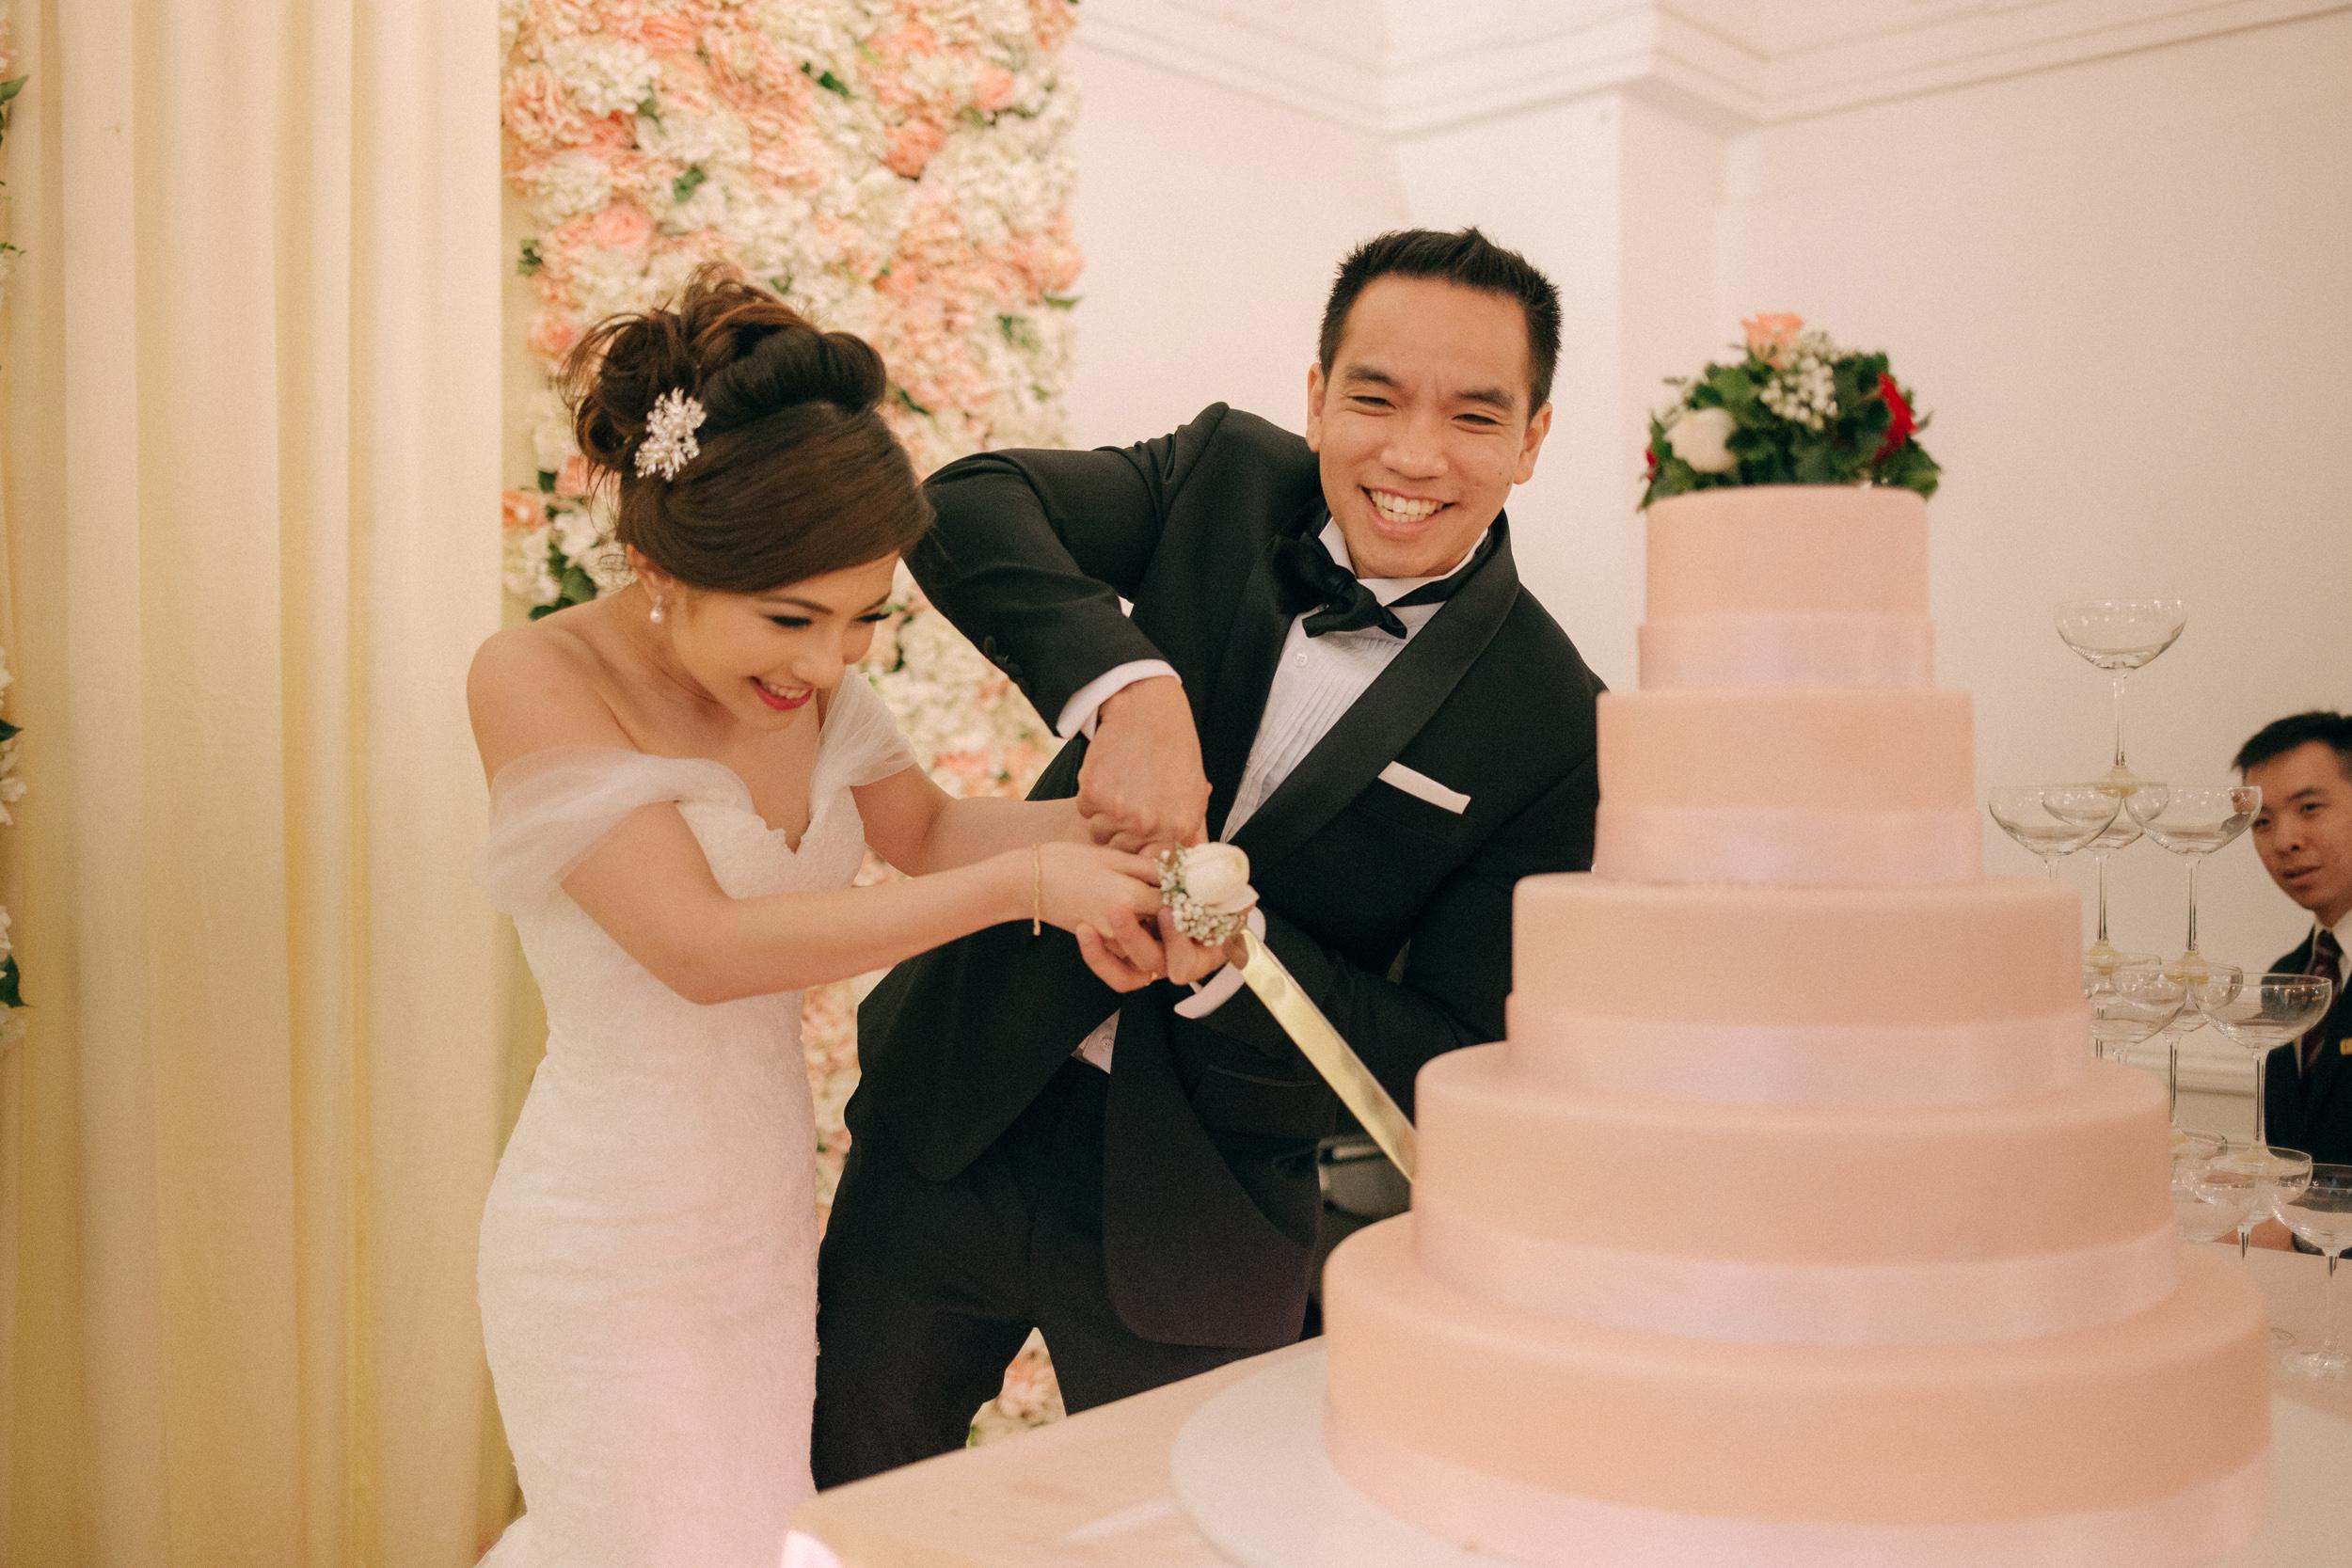 singapore-wedding-photographer-cheryl-matthew-fullerton-hotel-wedding-59.jpg